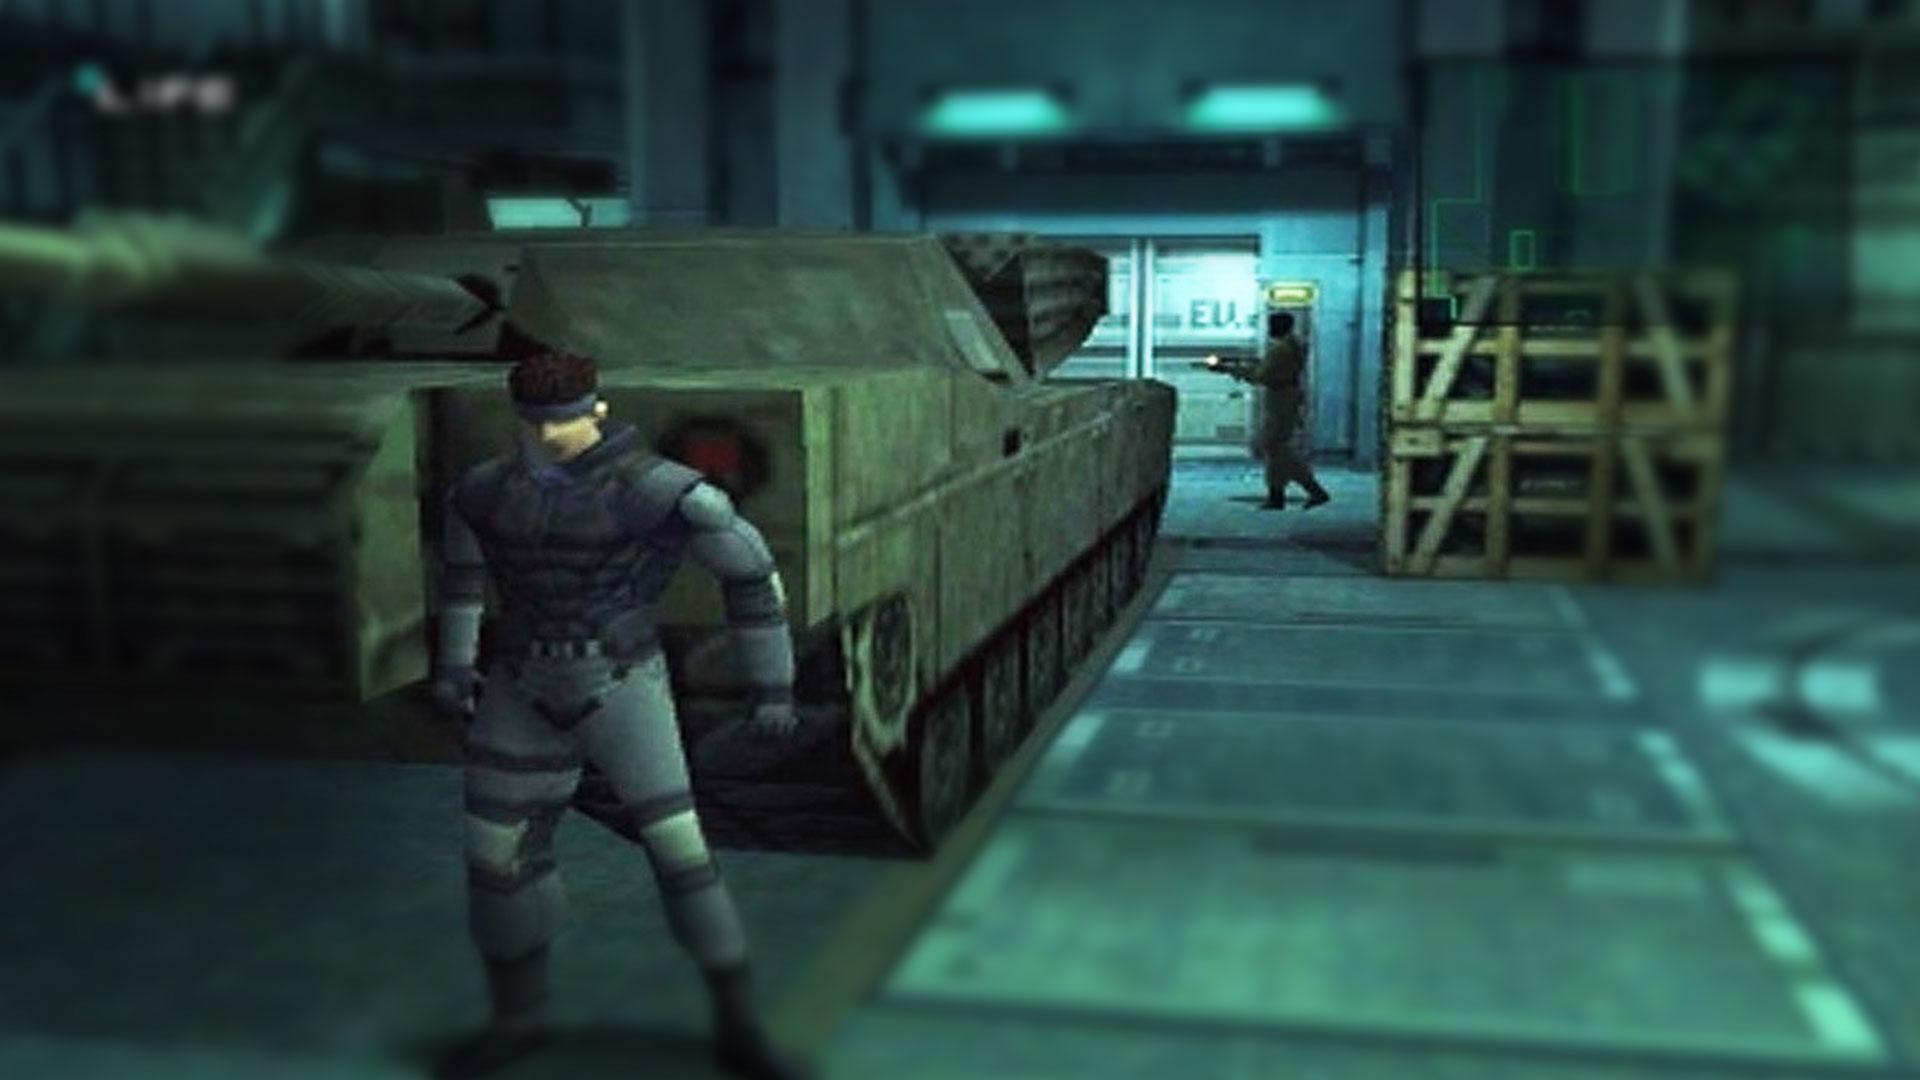 Metal Gear Solid сюжет в шутере